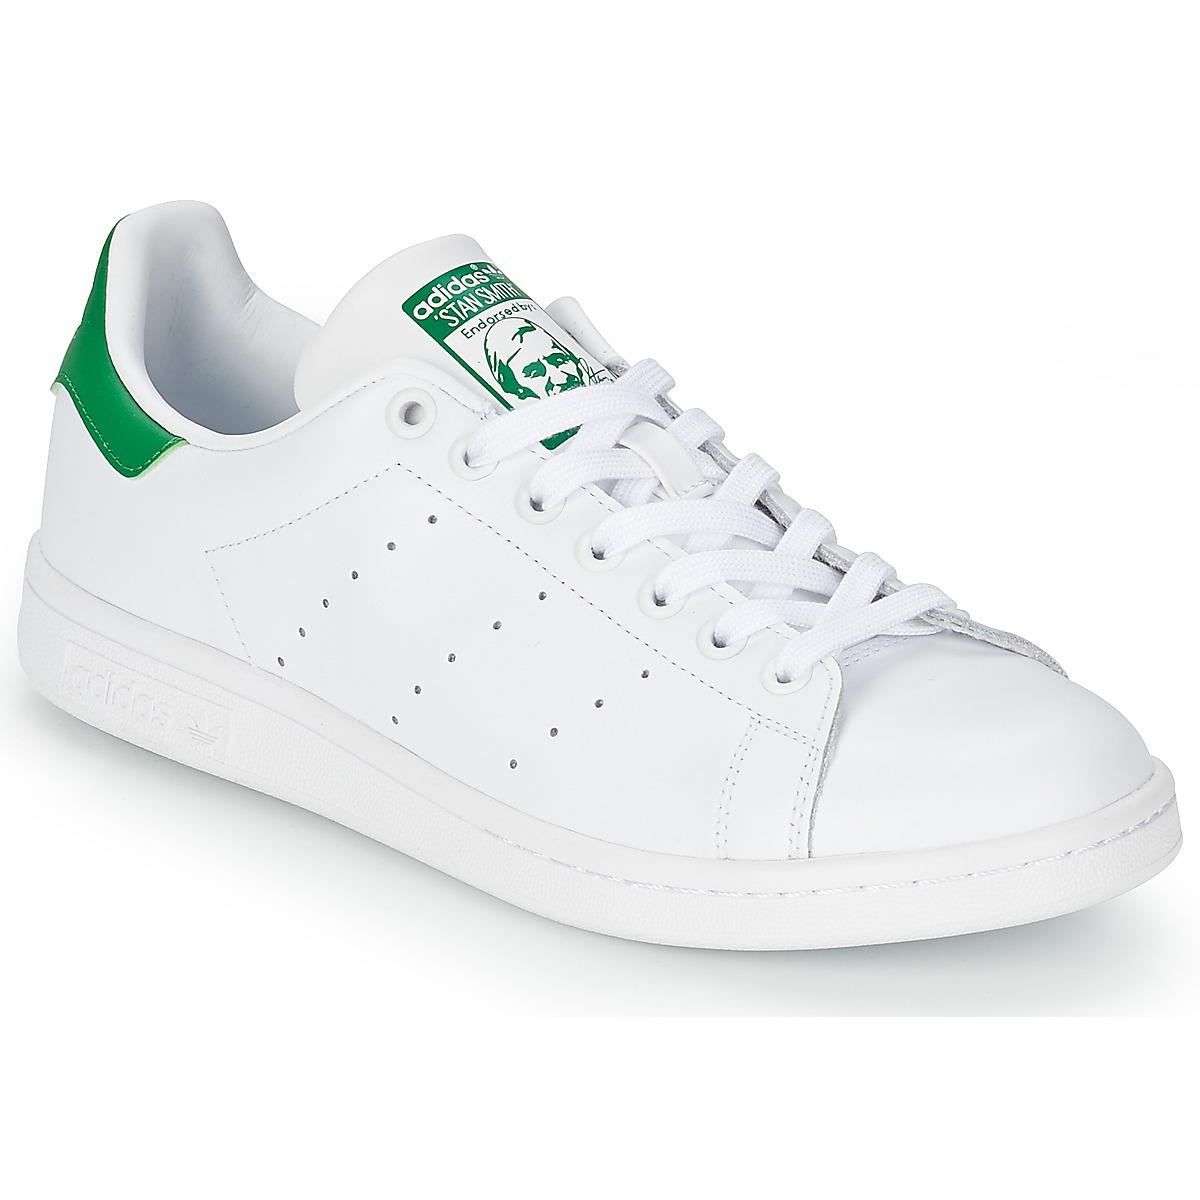 adidas Originals STAN SMITH White / Green